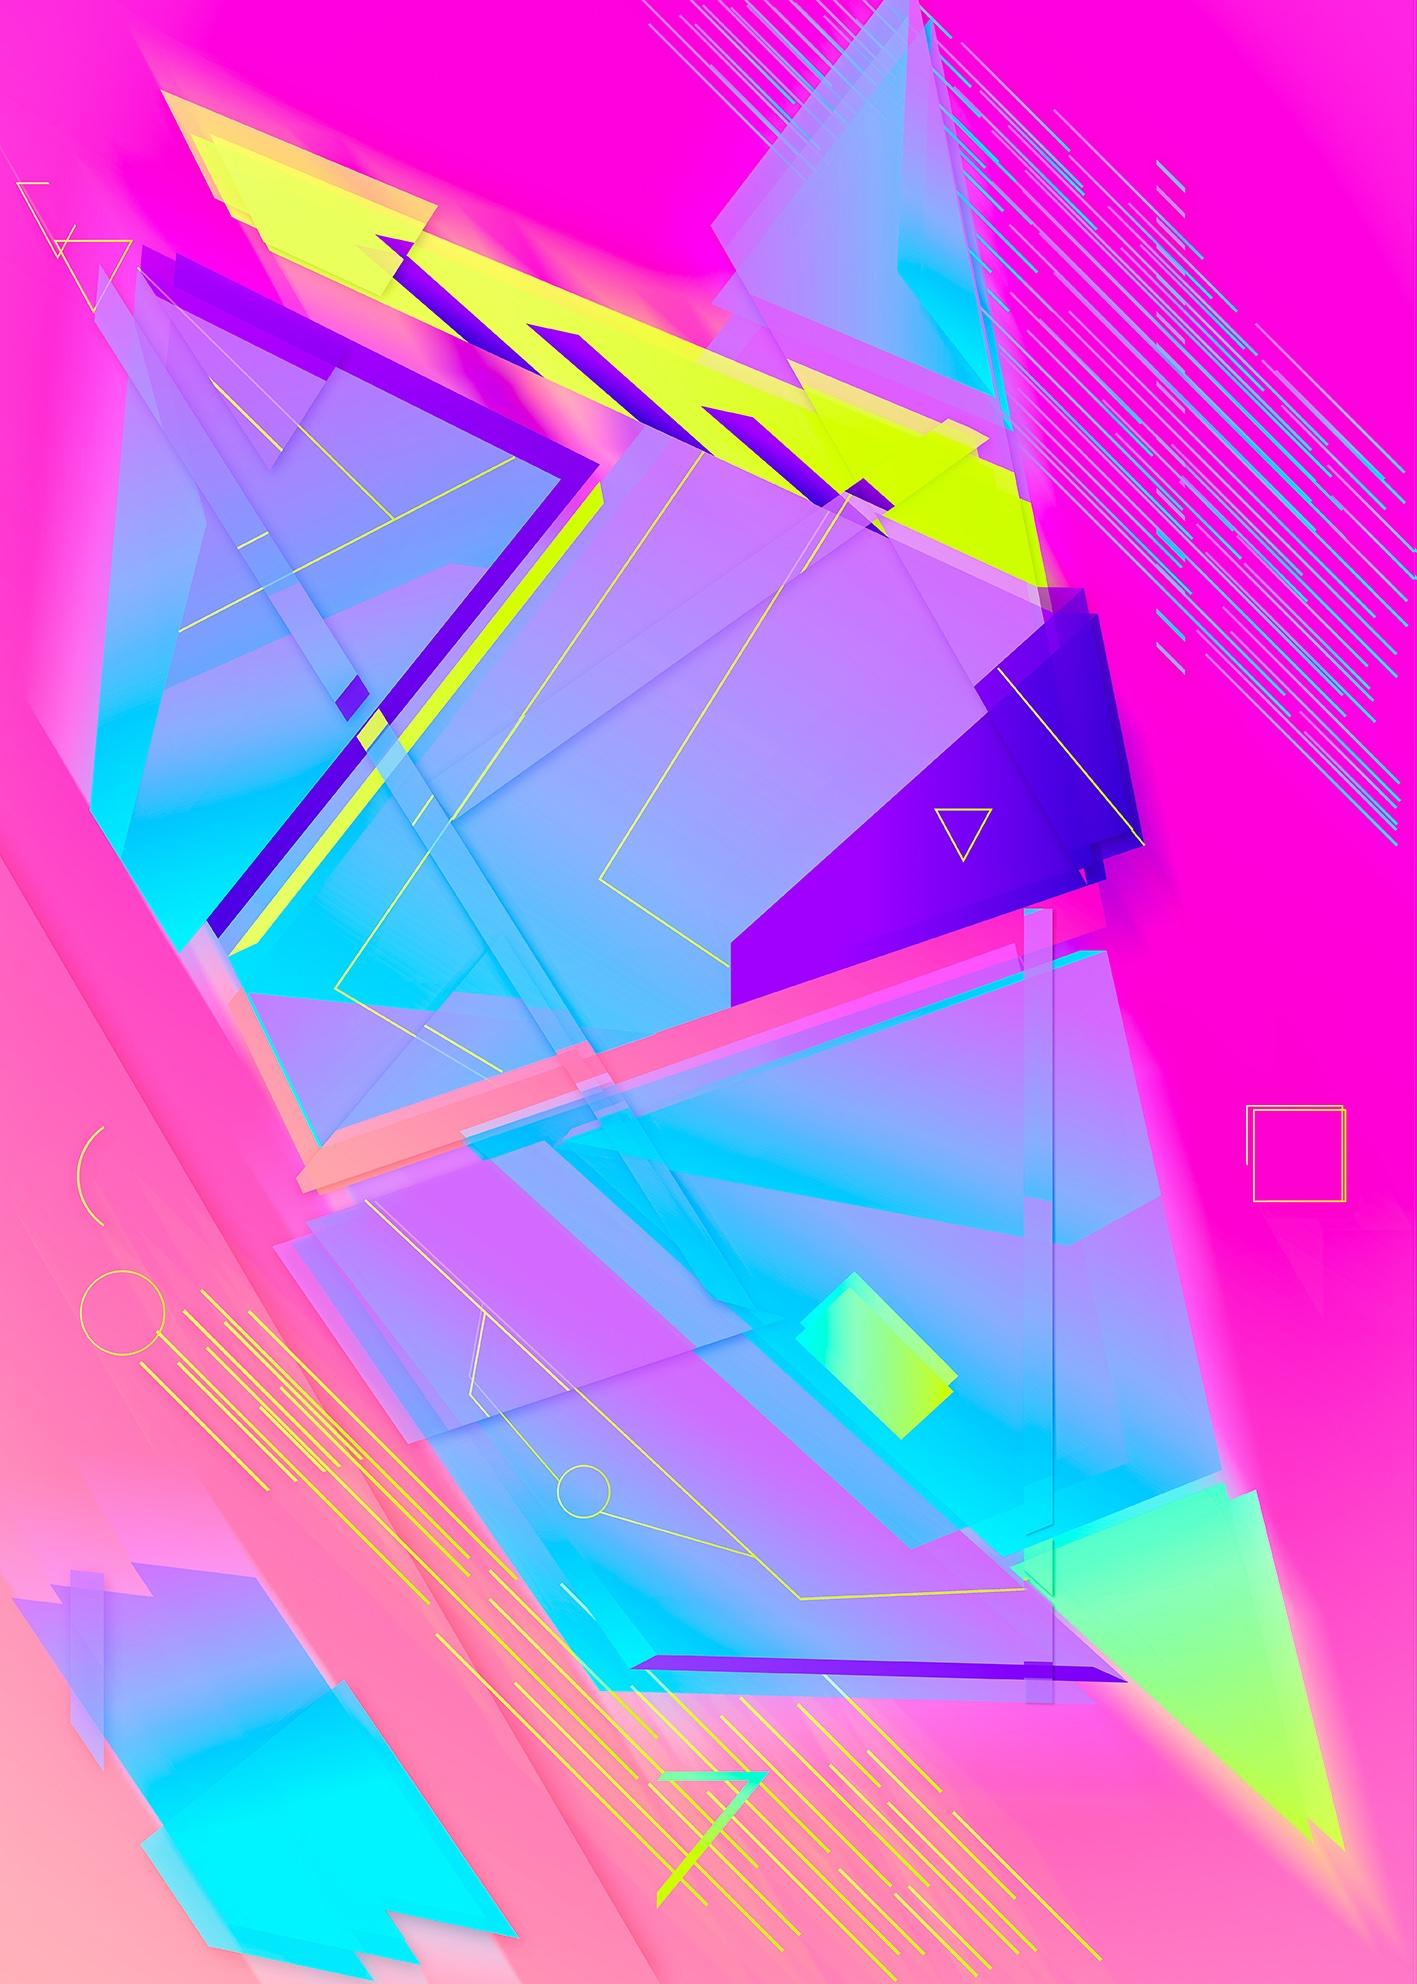 digitalart, art, design, abstract - univerz | ello